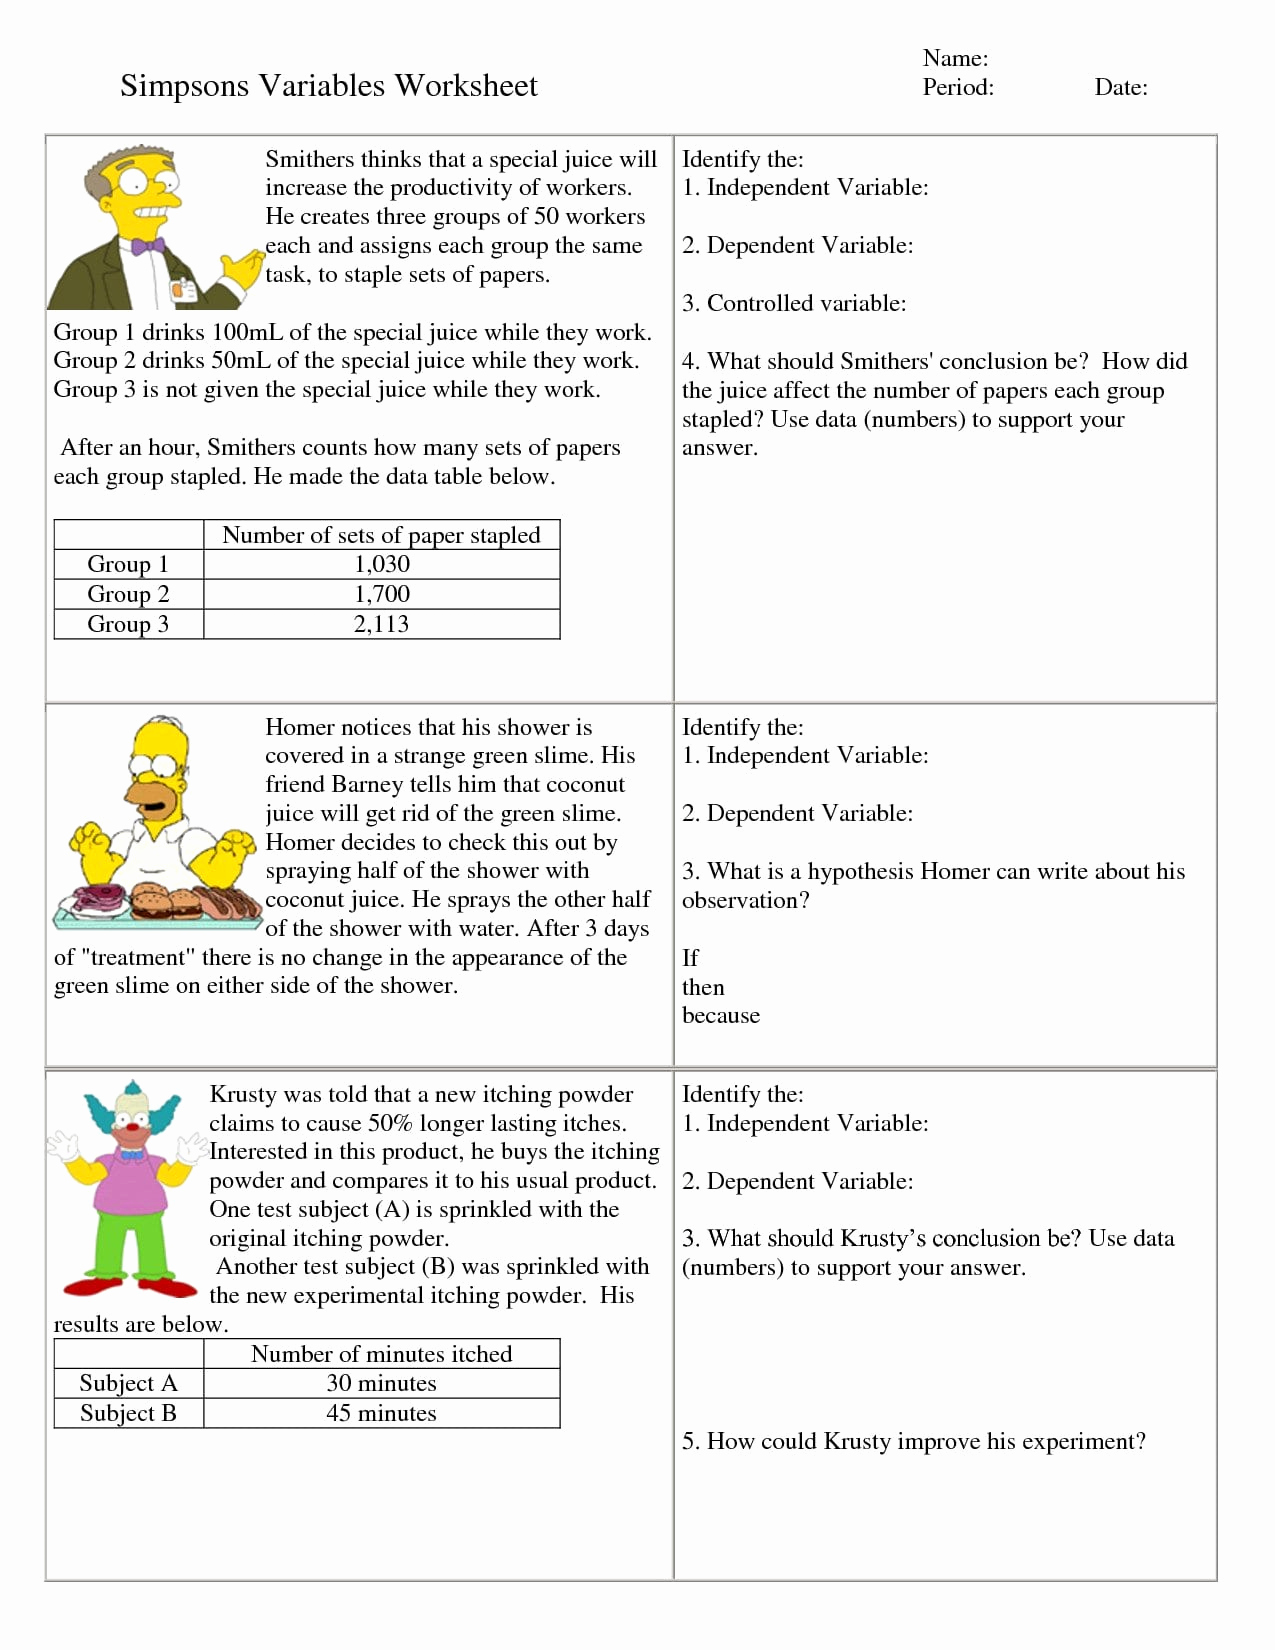 Dependent Probability Worksheets Best Of Independent and Dependent Probability Worksheet with